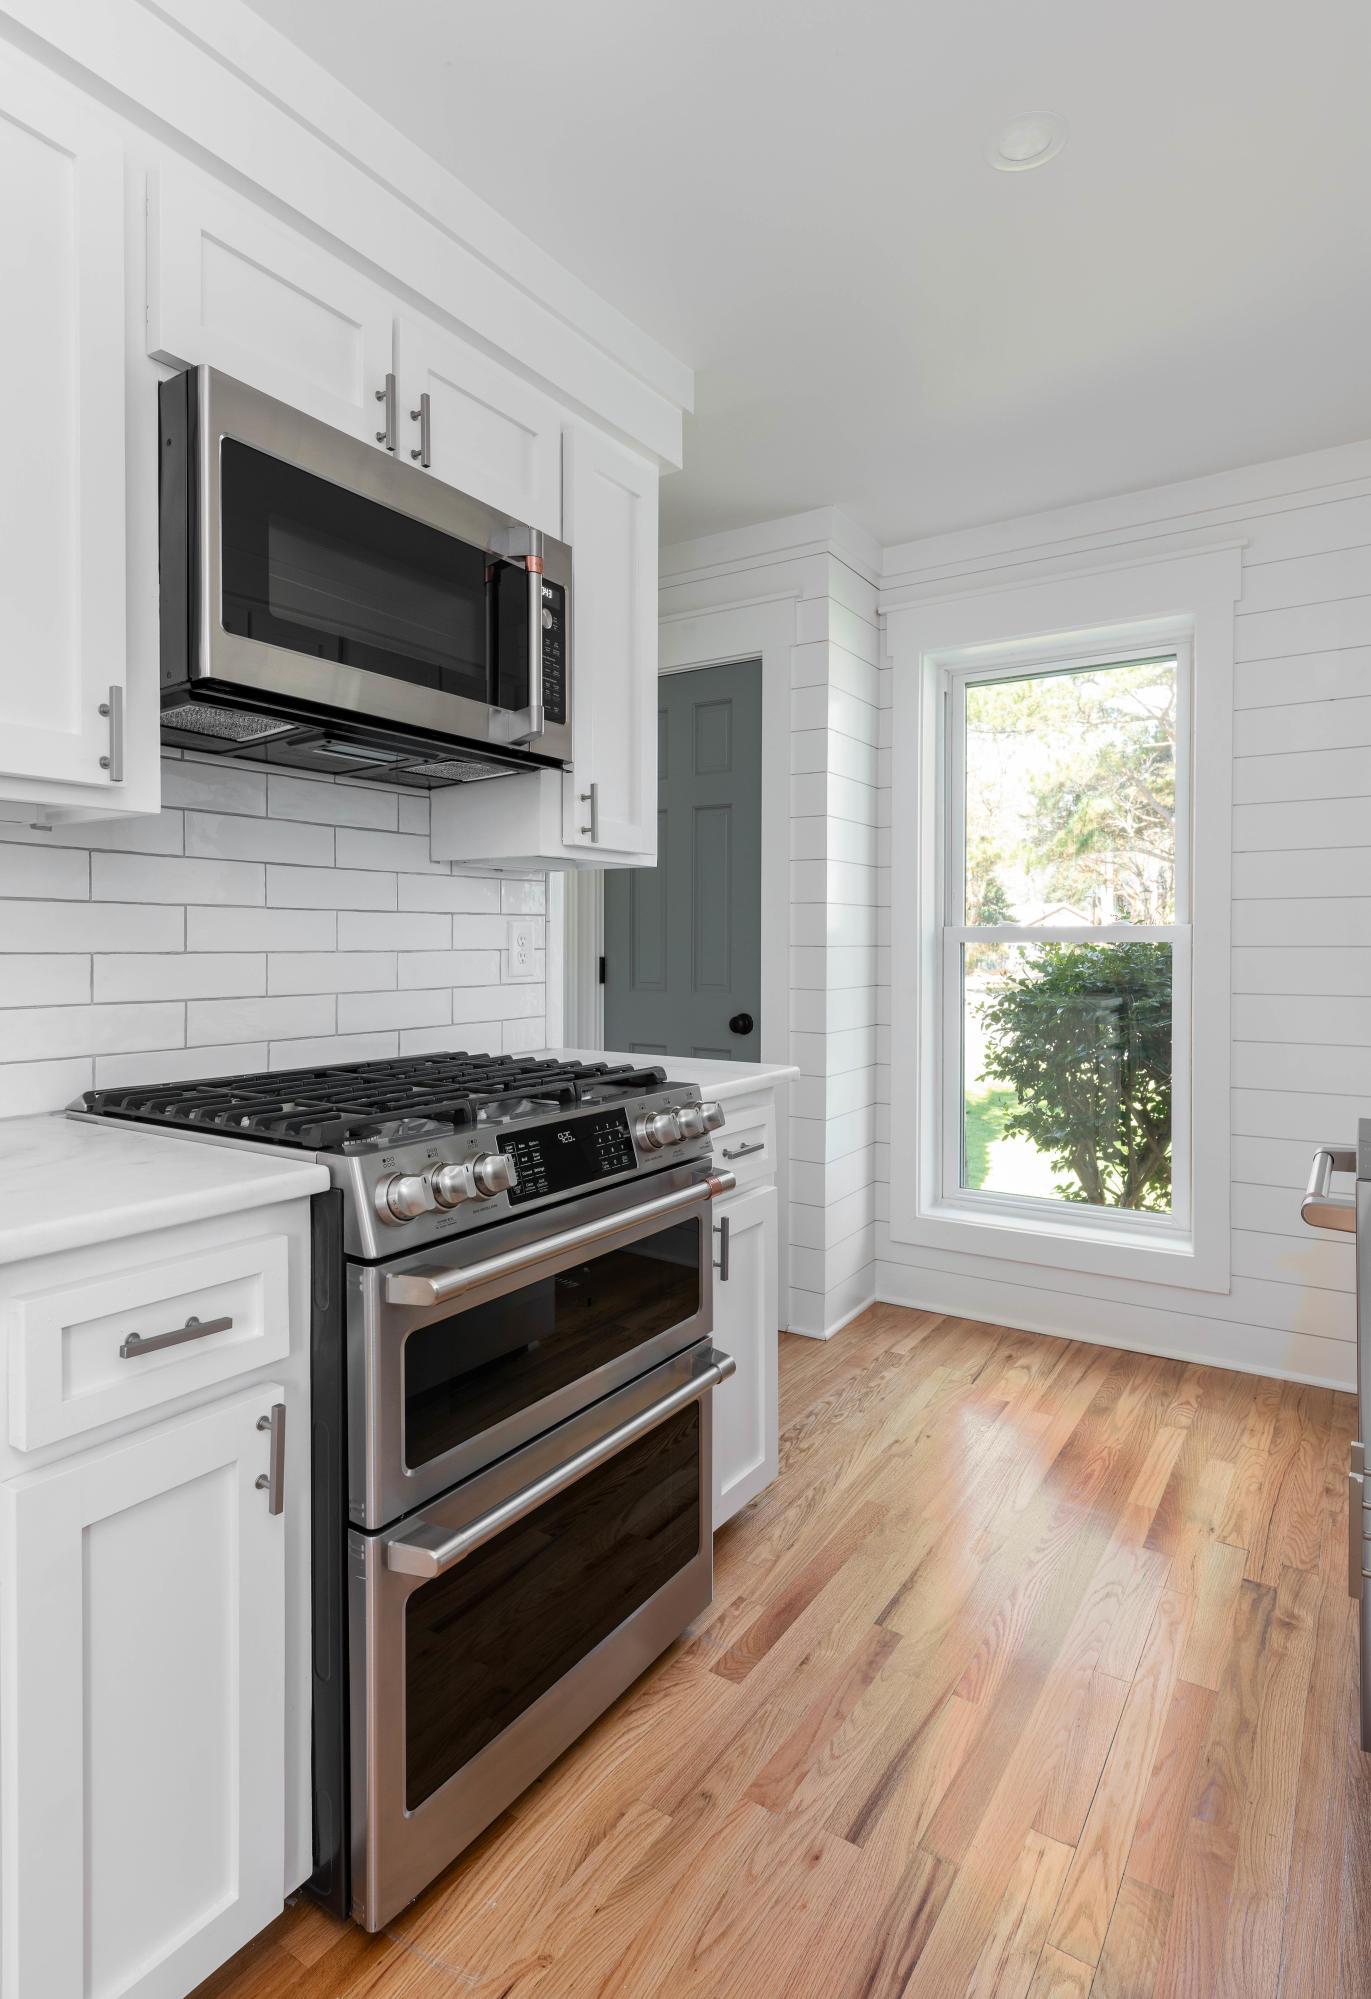 Shemwood II Homes For Sale - 925 Jacksnipe, Mount Pleasant, SC - 25